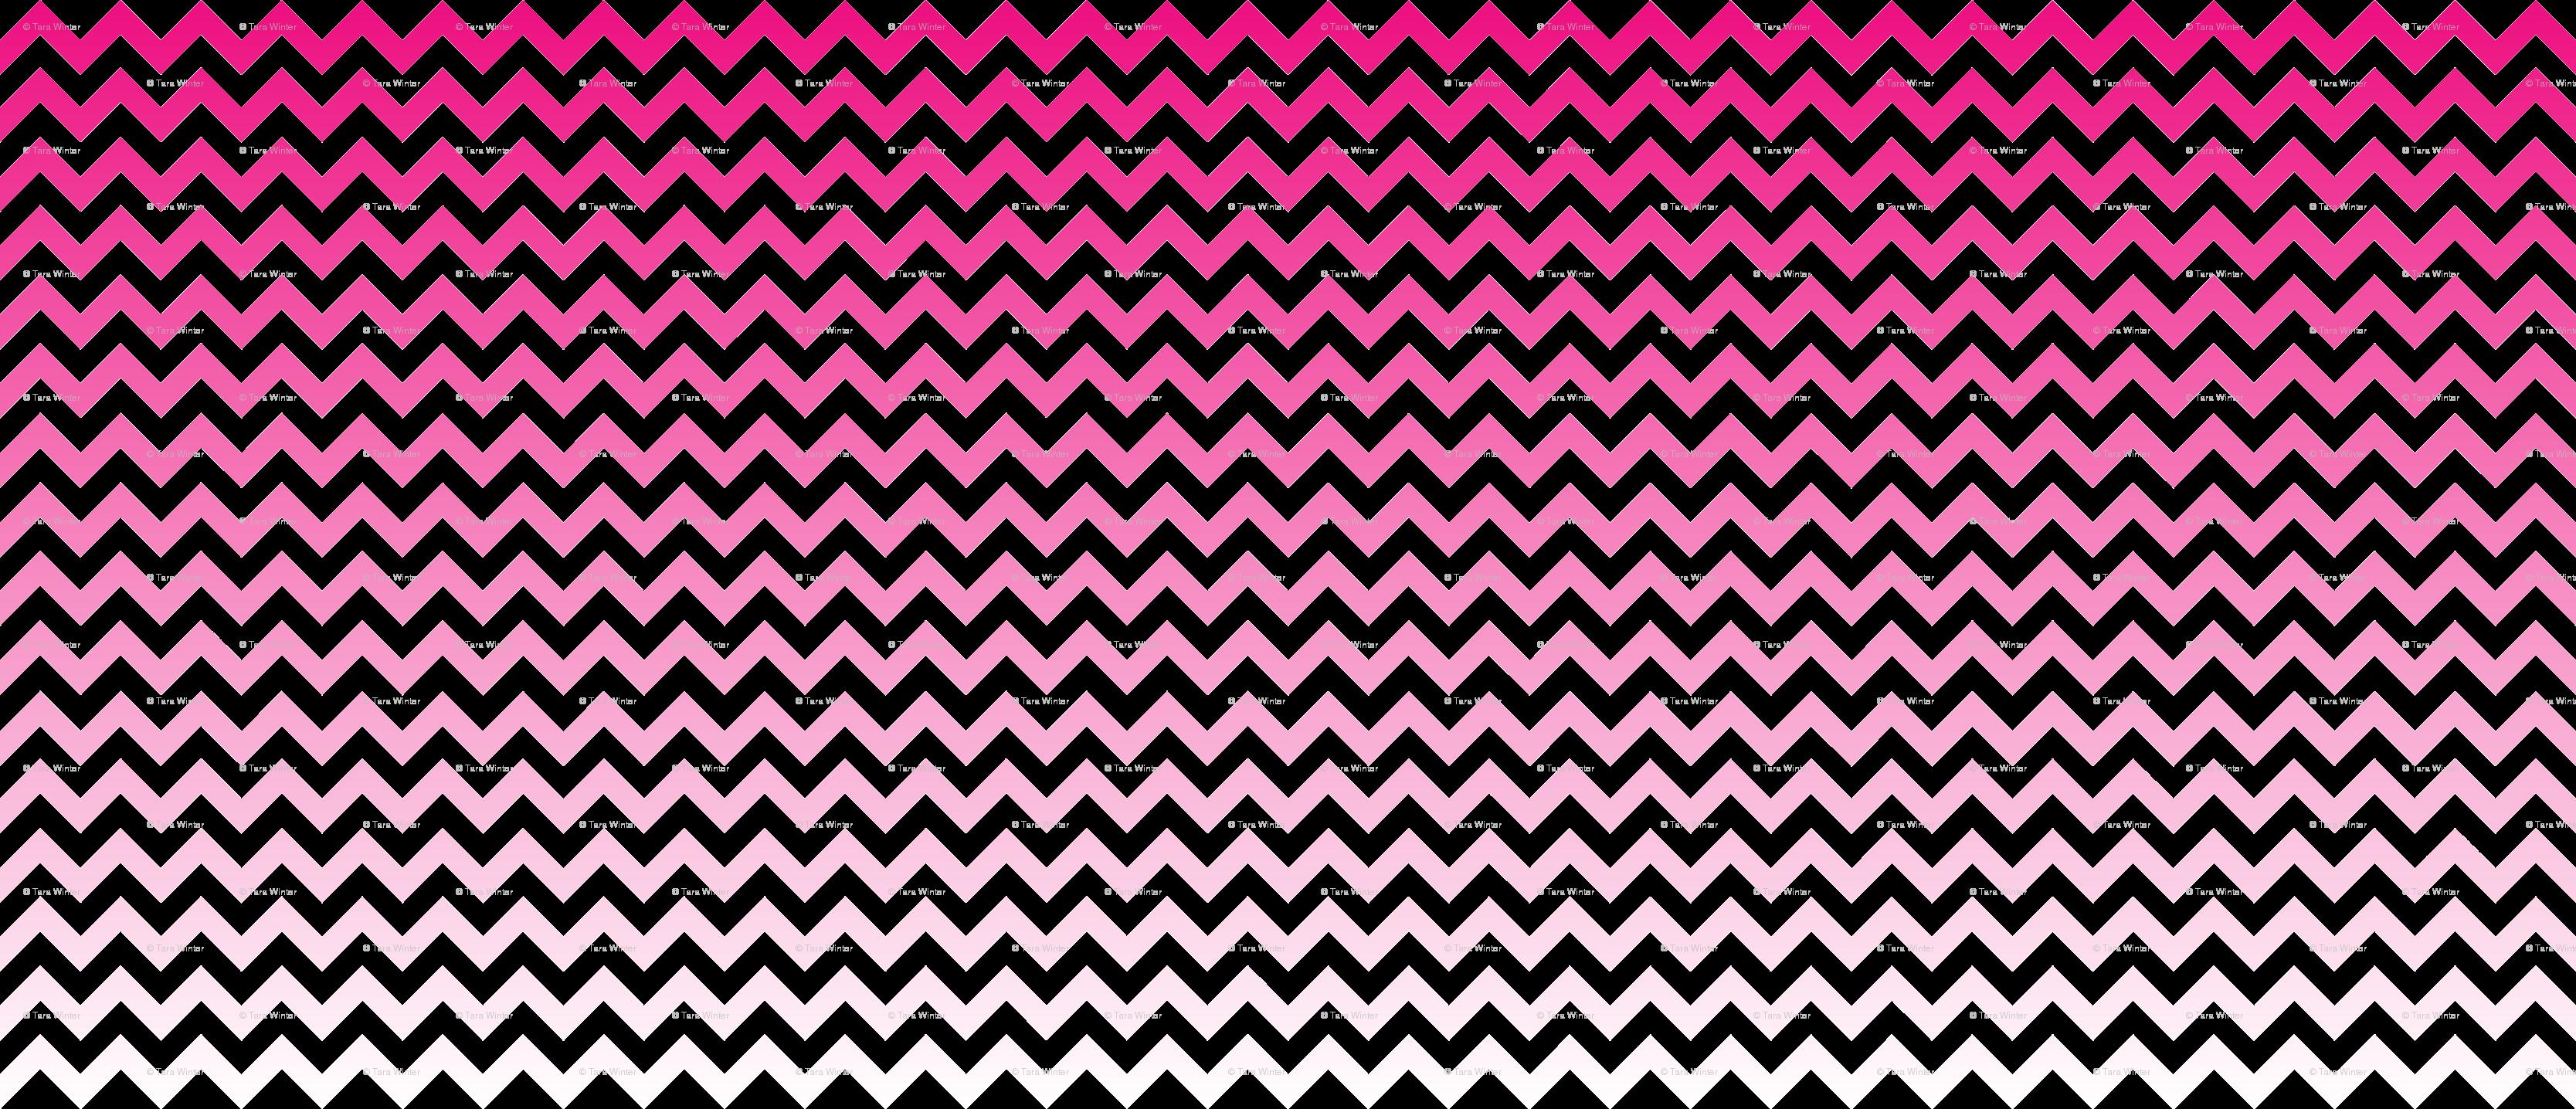 Pink Chevron Wallpaper Wallpapersafari